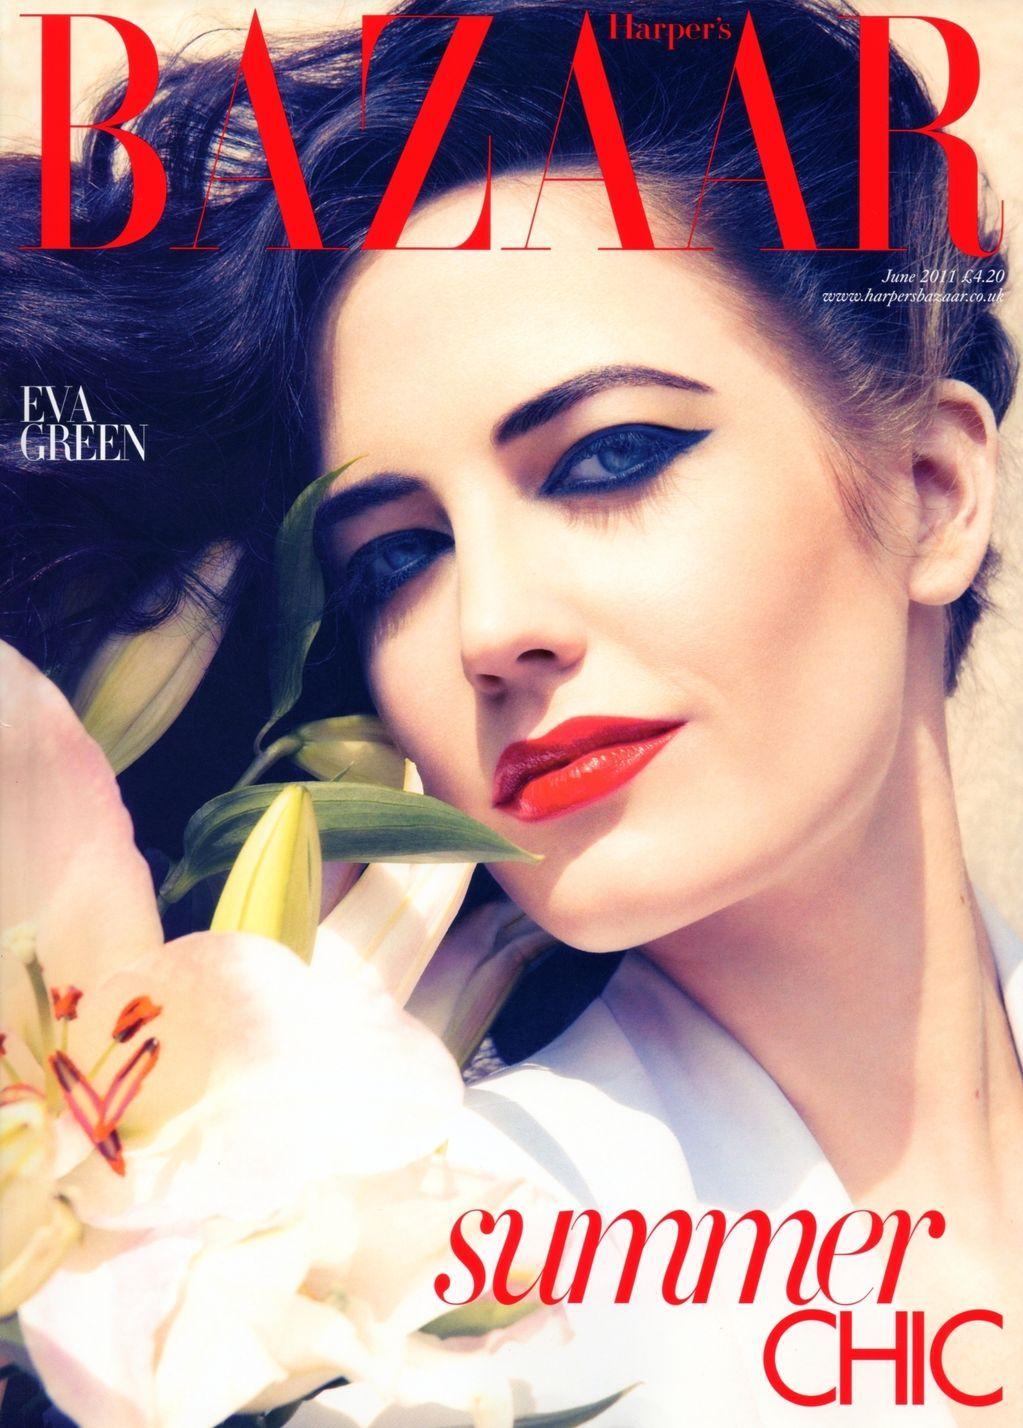 UK Harper's Bazaar 2011 - Eva Green by Camilla Akrans